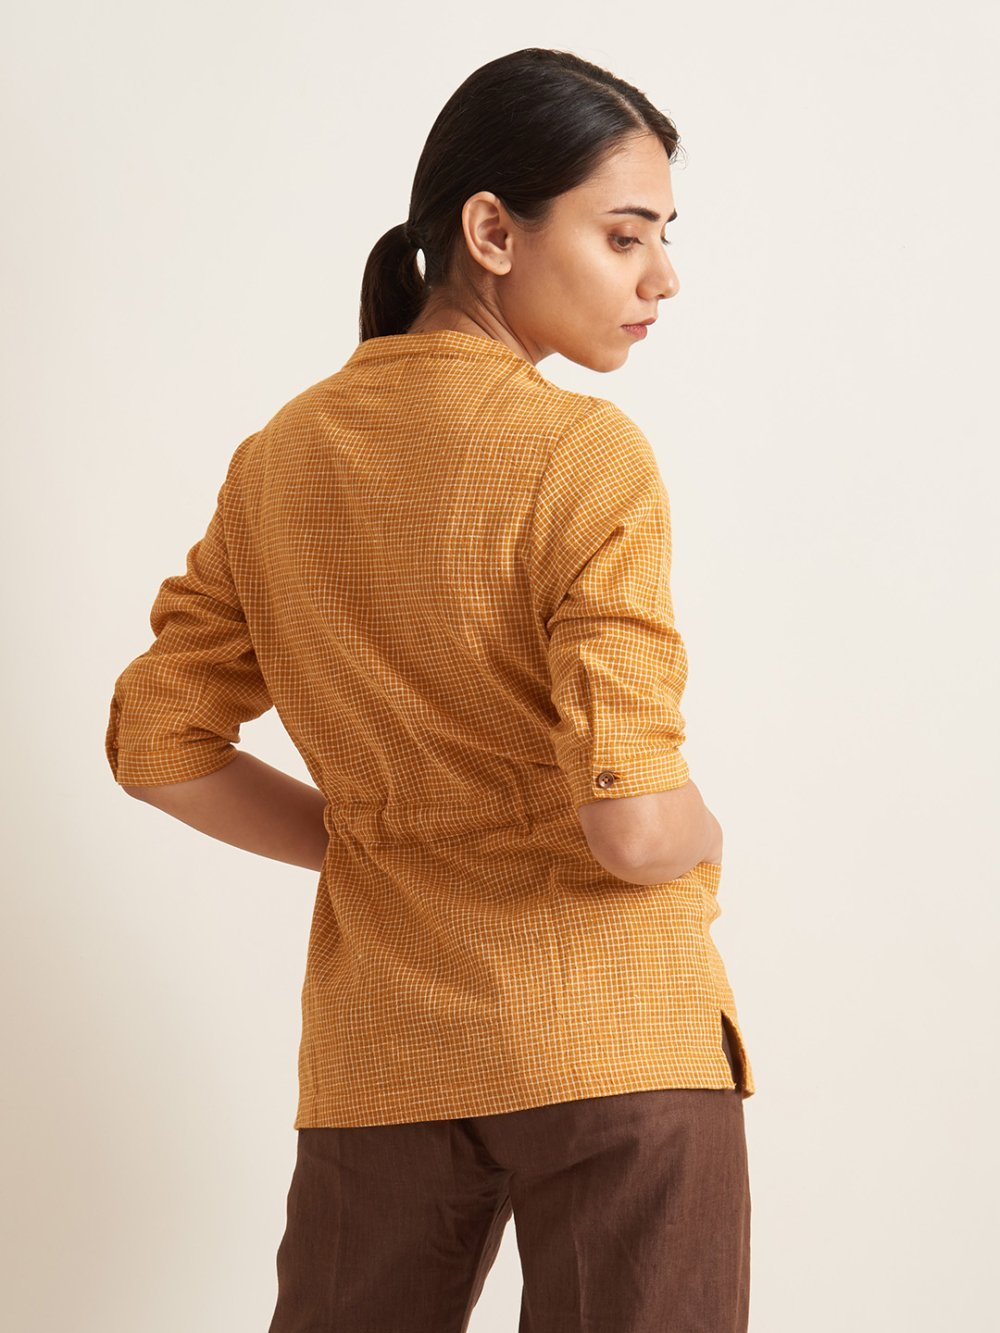 Organic Clothing Linen Woman Shirt